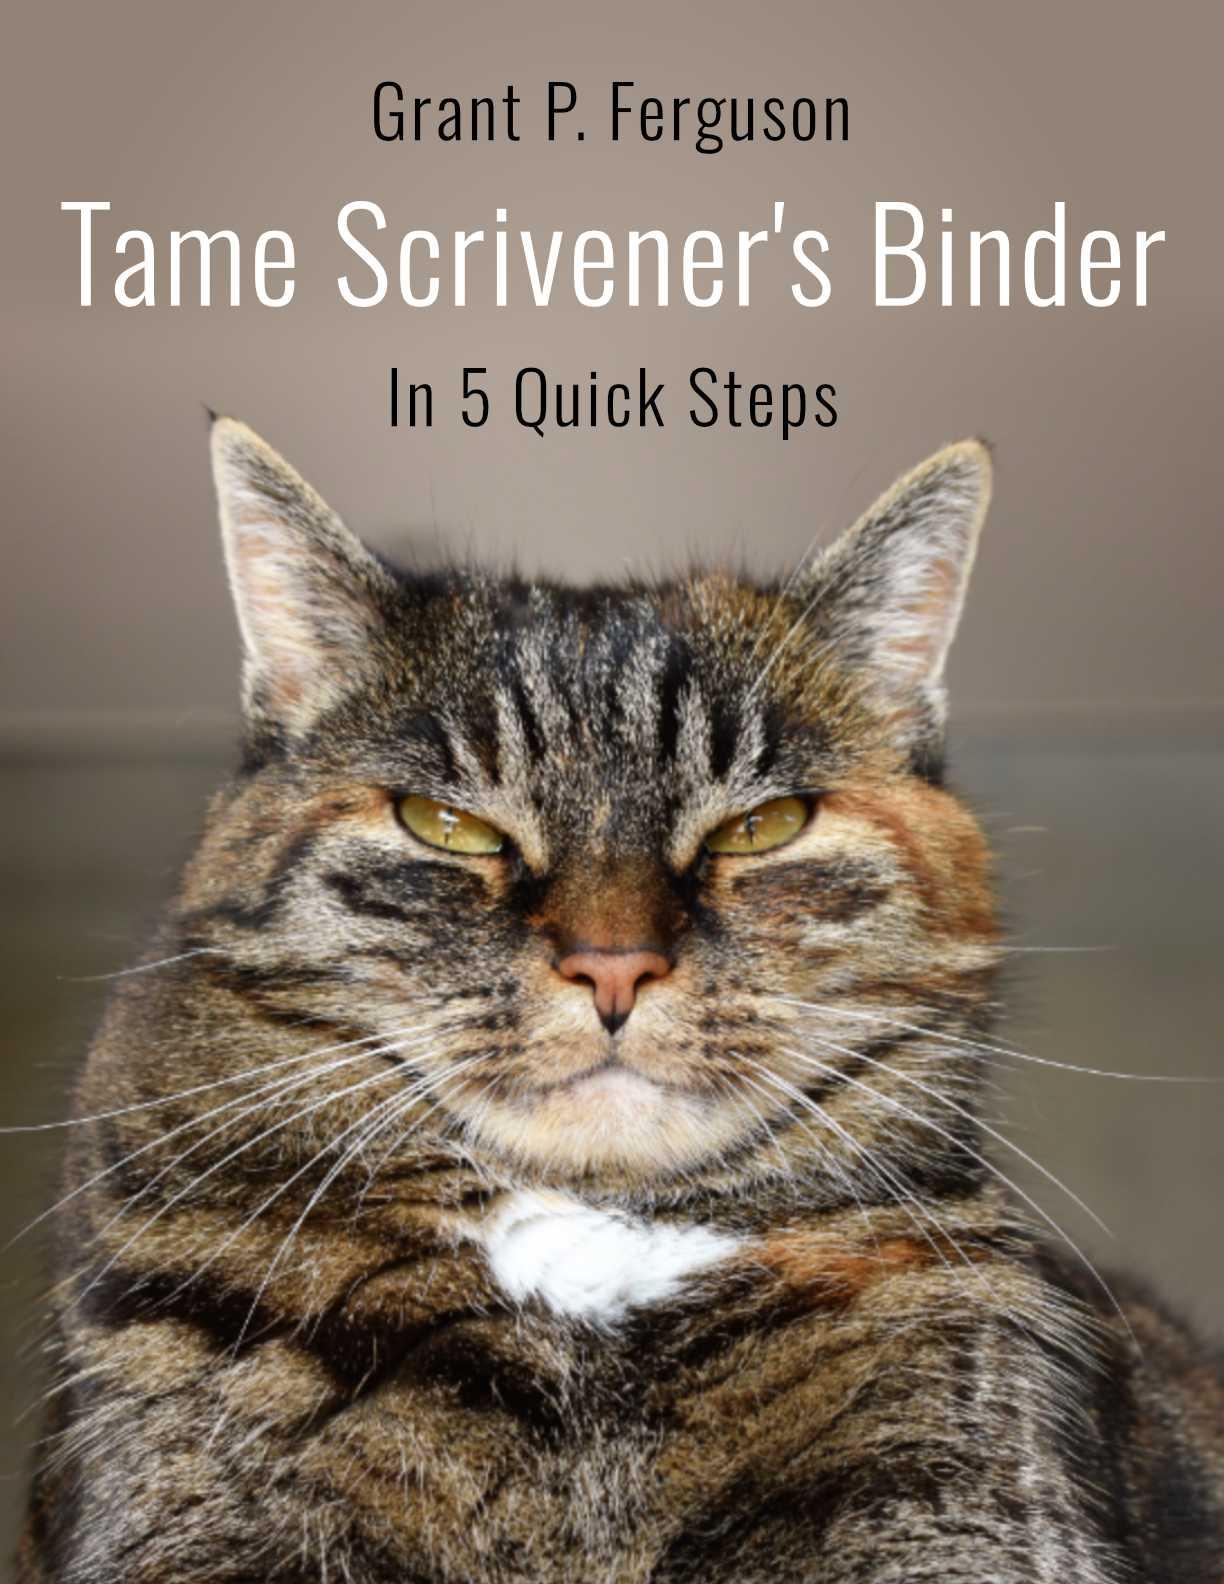 Tame Scrivener's Binder